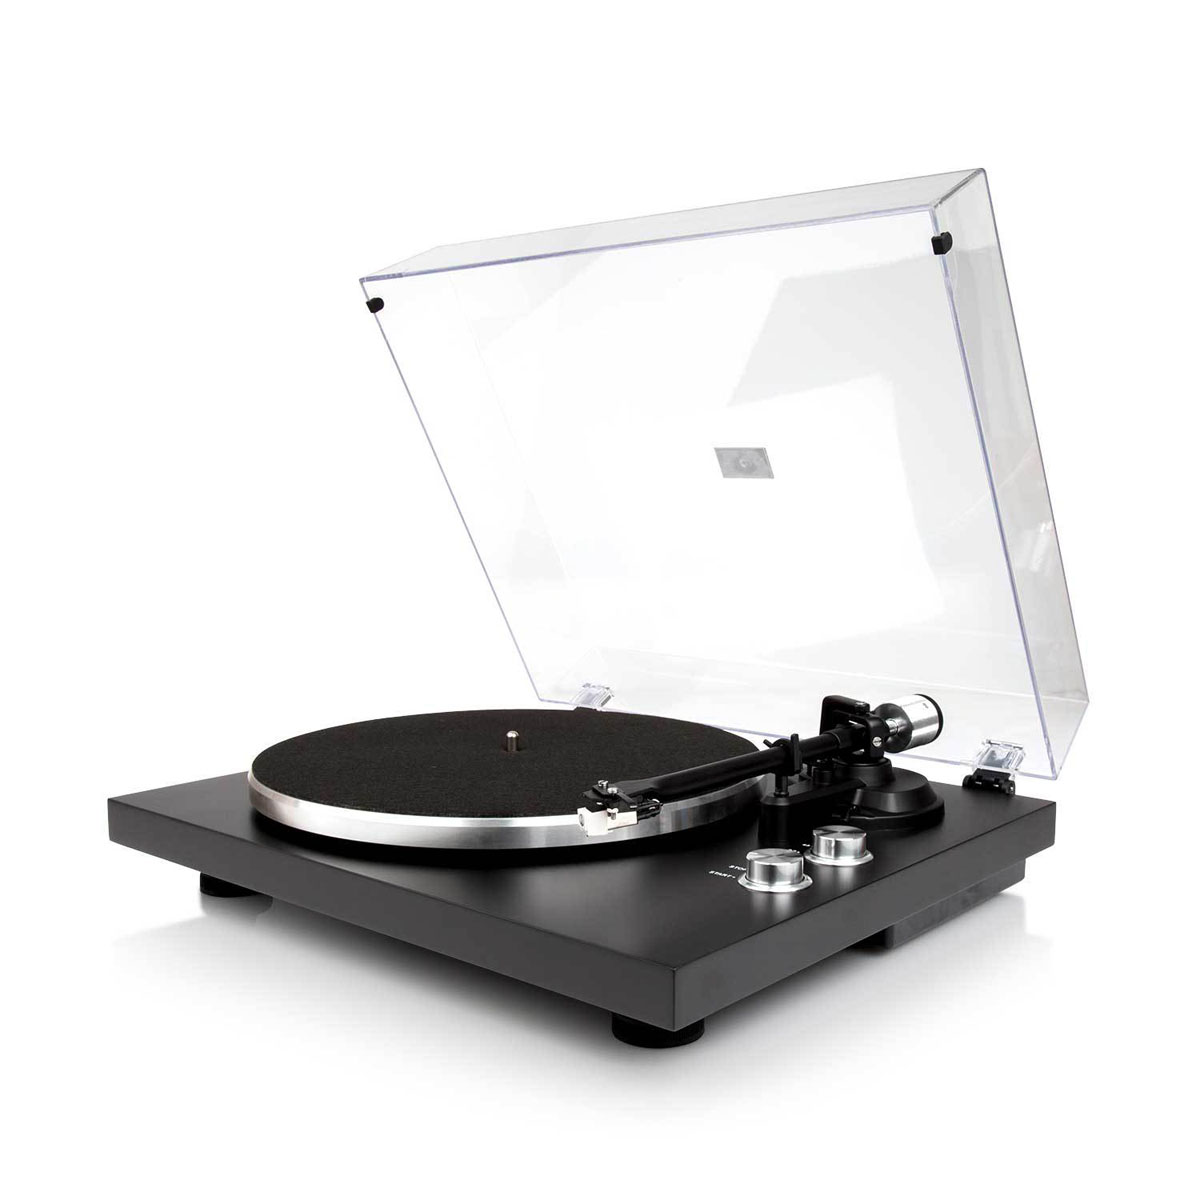 Argon Audio TT Plattenspieler incl. Phono Vorstufe und Audio-Technica AT3600L Tonabnehmer